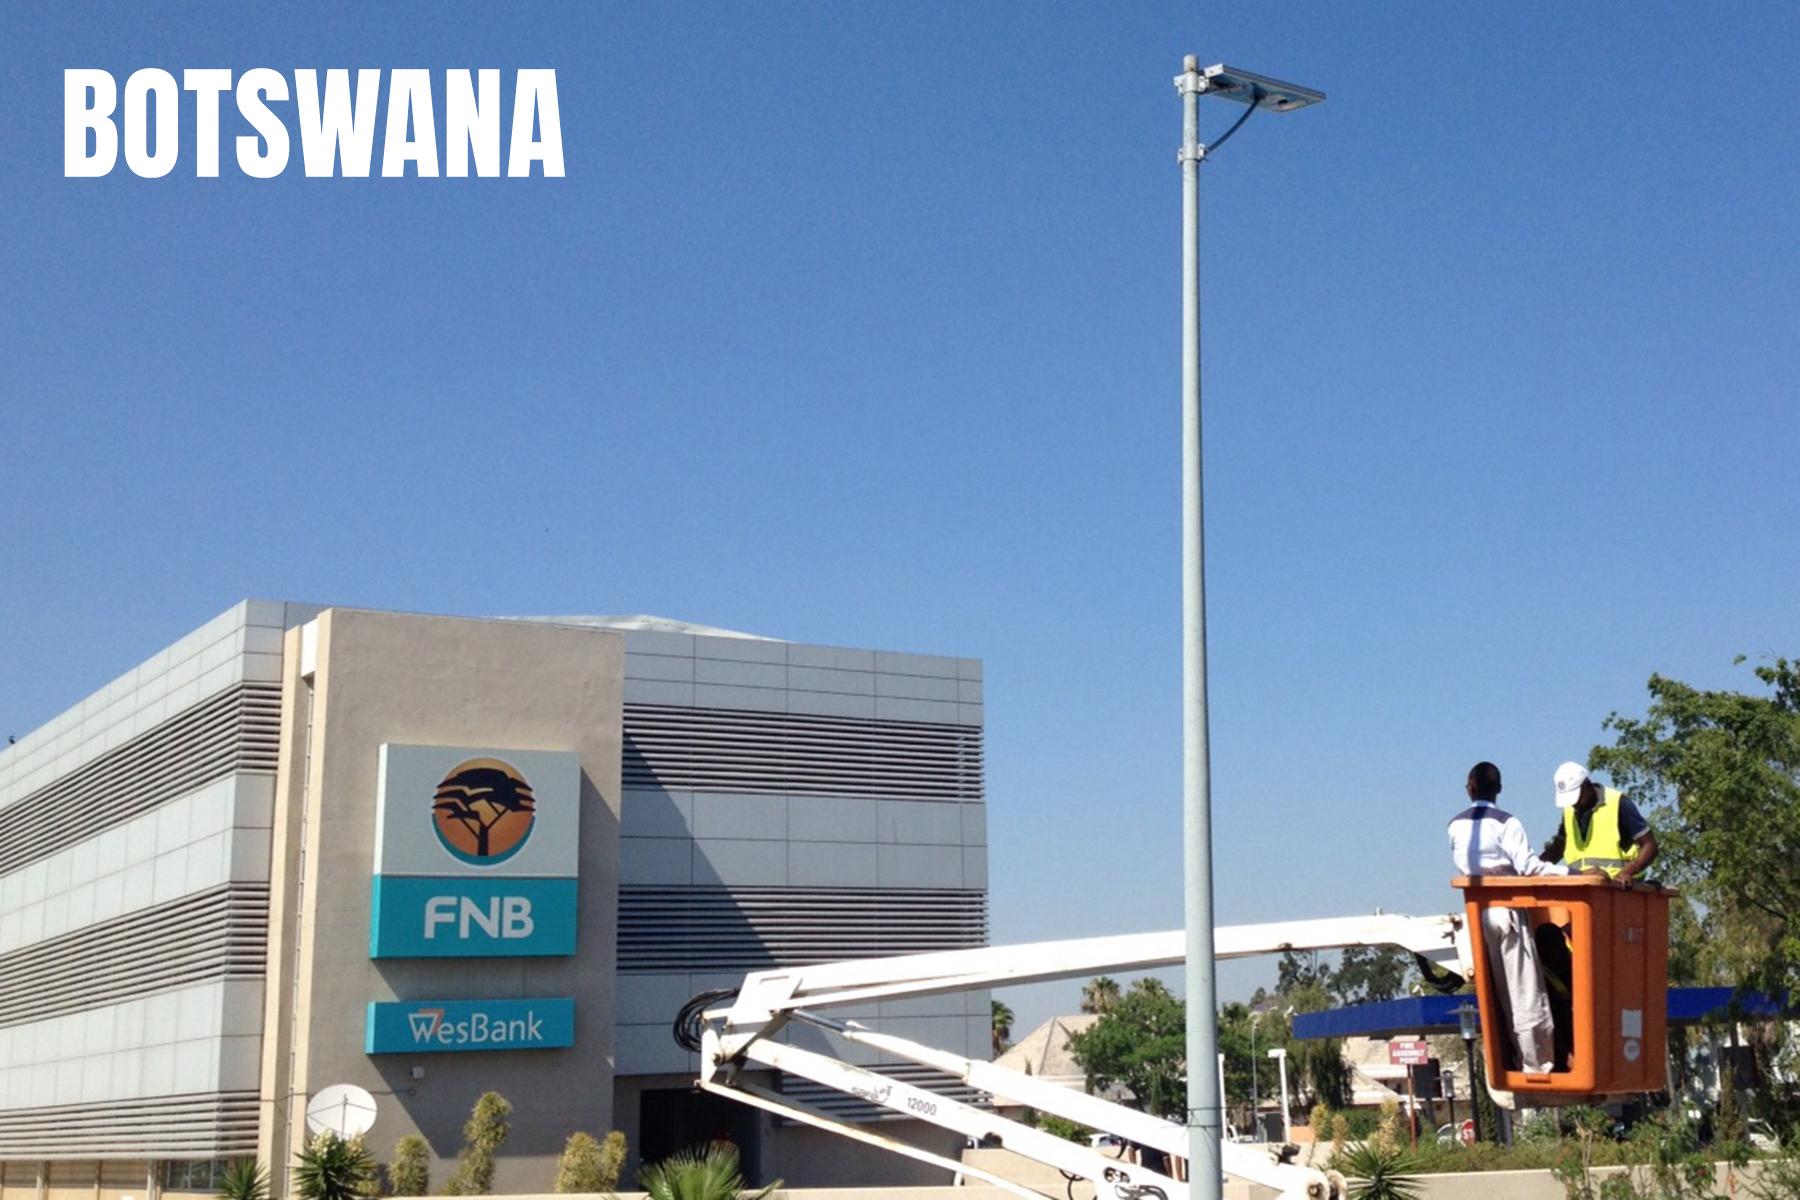 S3 Website - Image Carousel - 01 Botswan